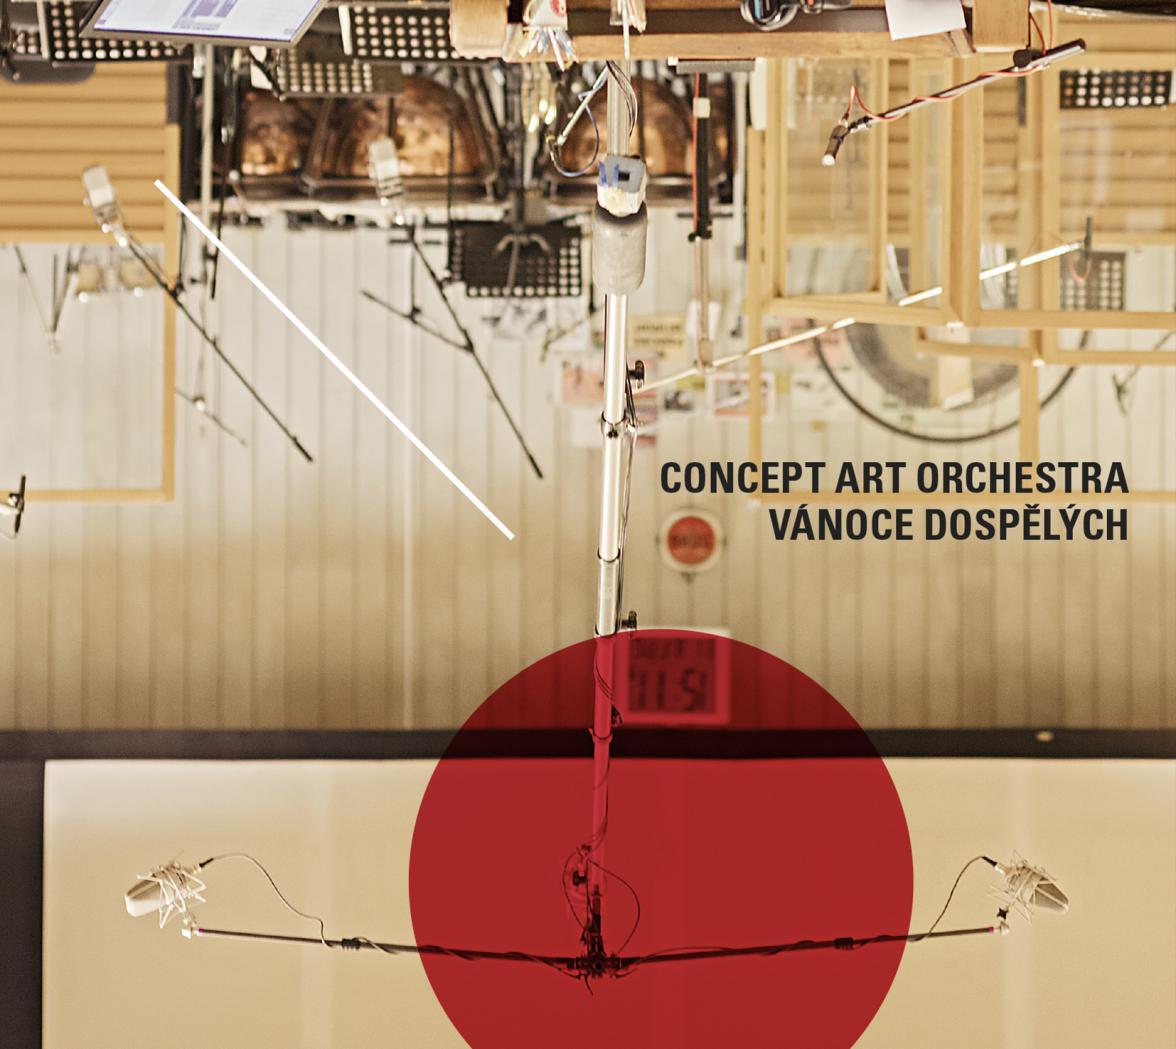 Concept Art Orchestra: Vánoce dospělých